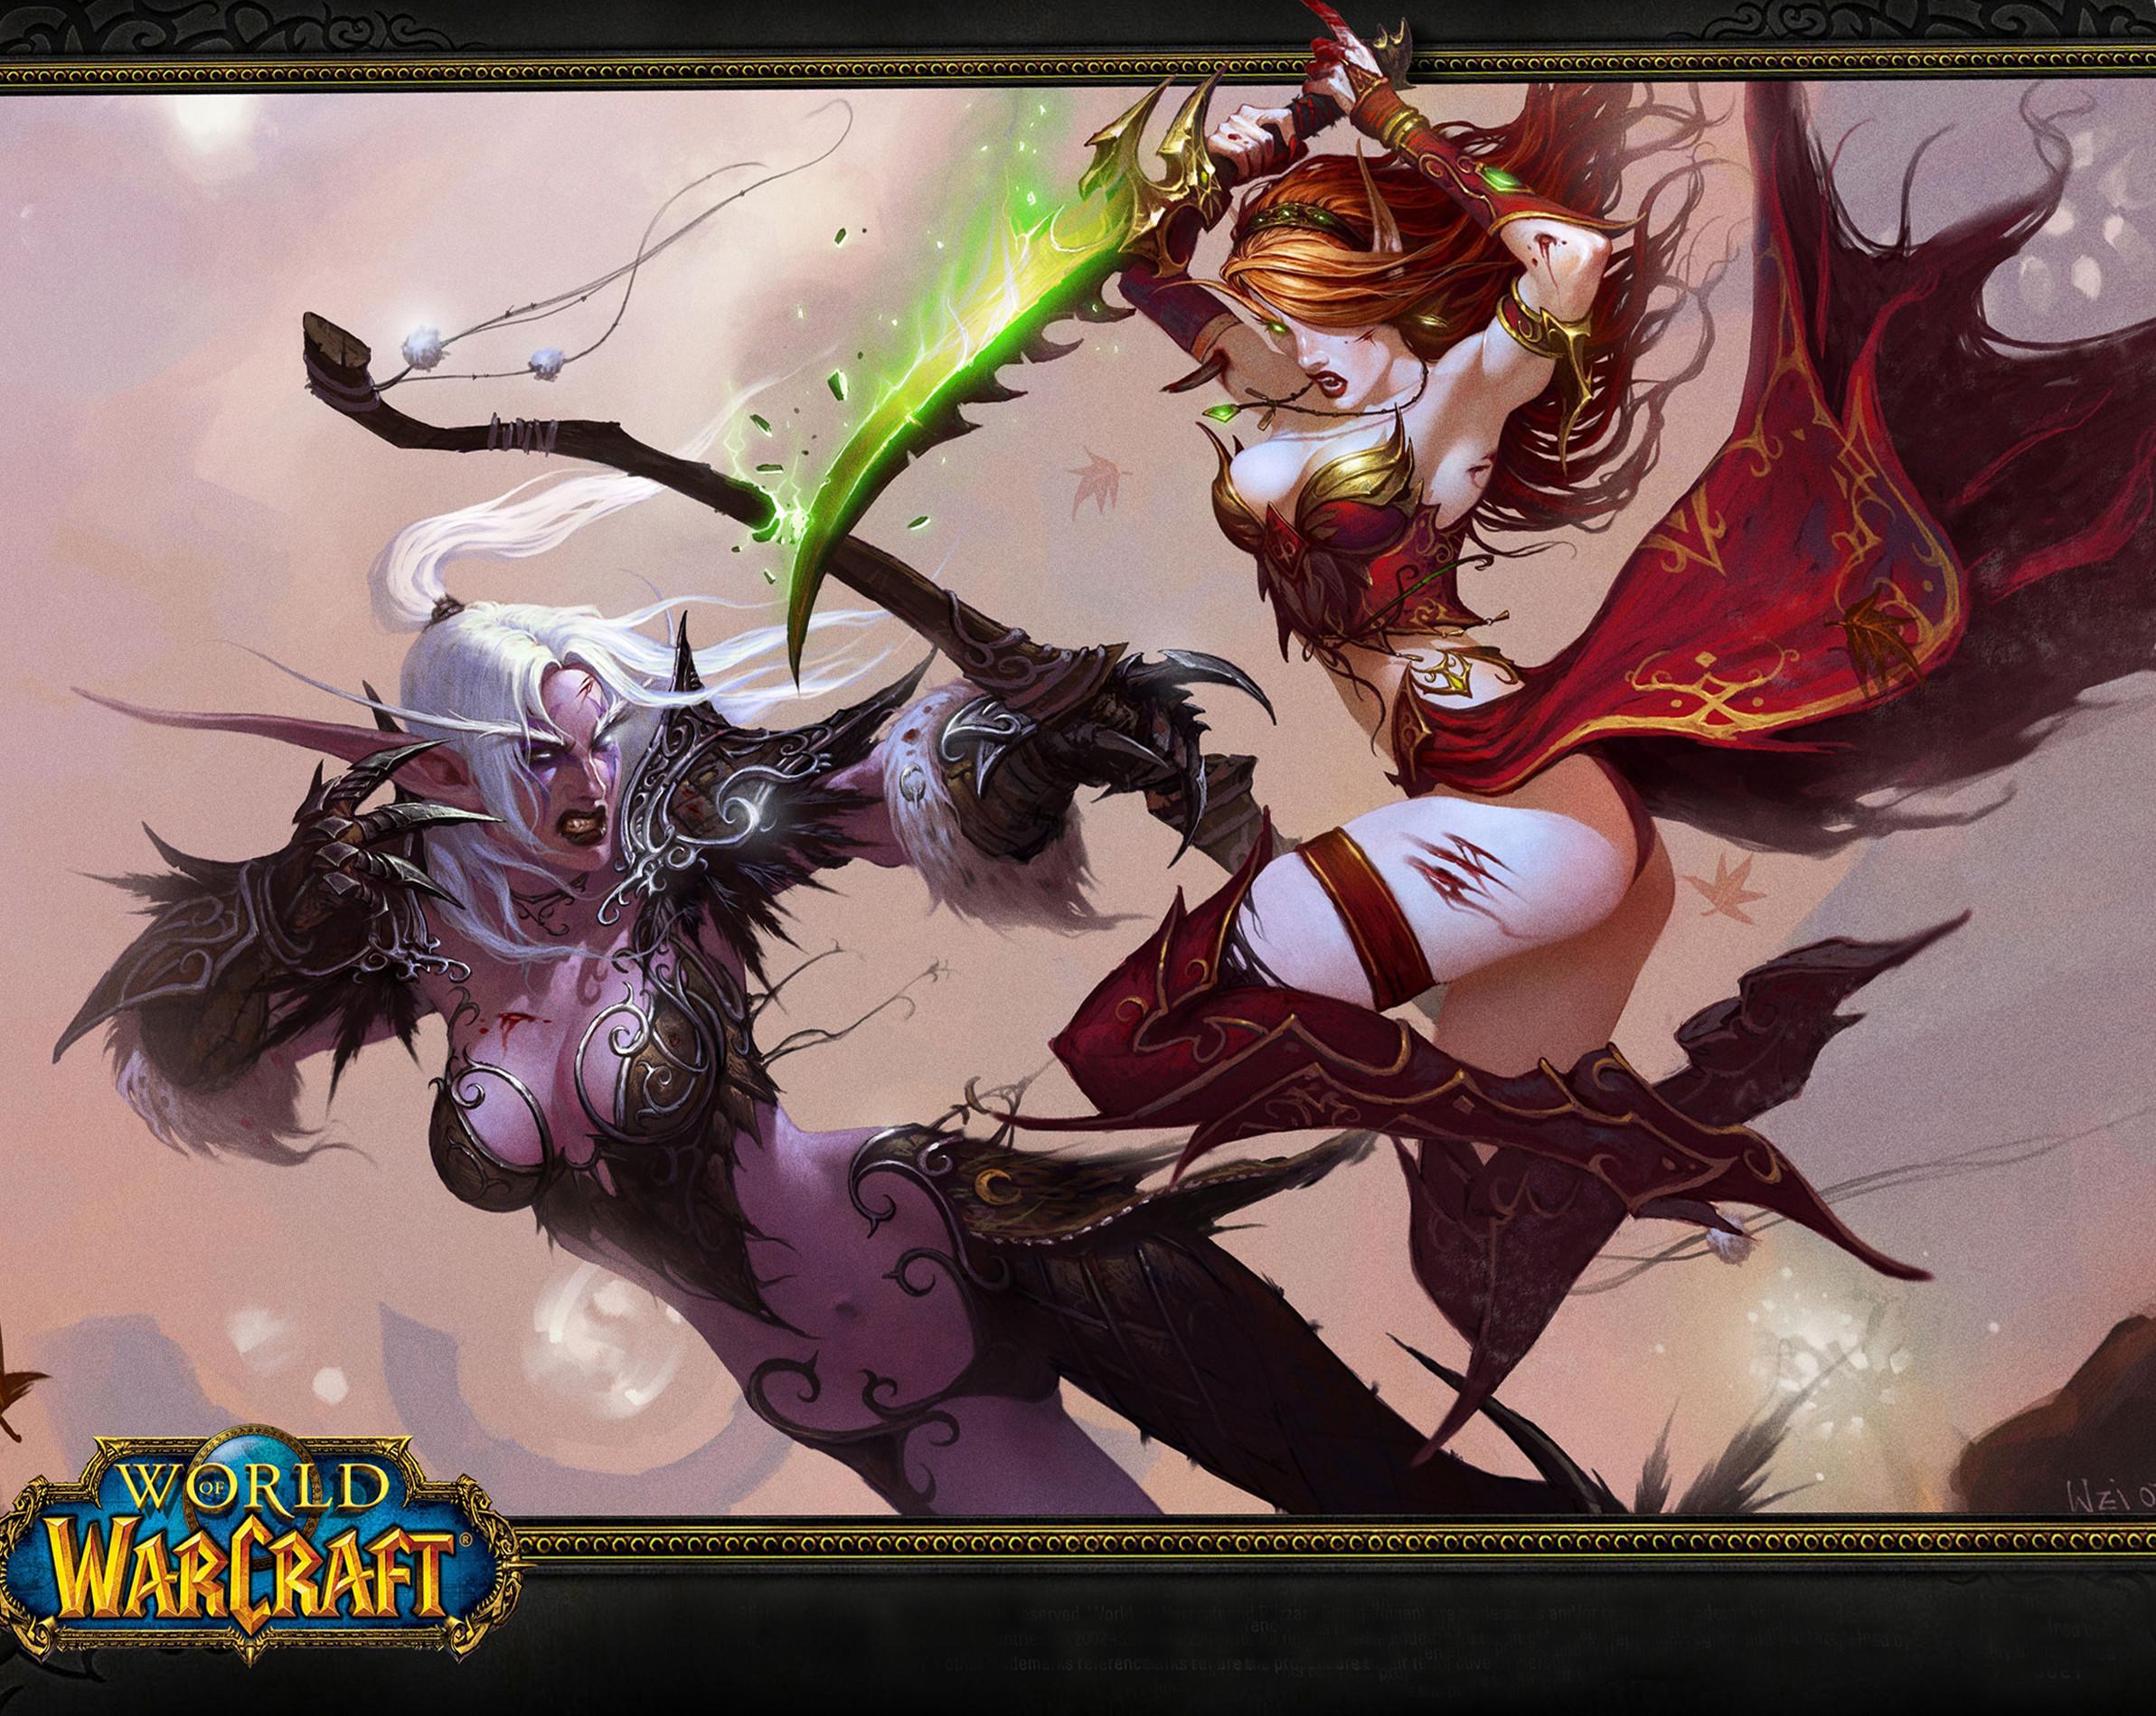 Night Elf vs Blood Elf